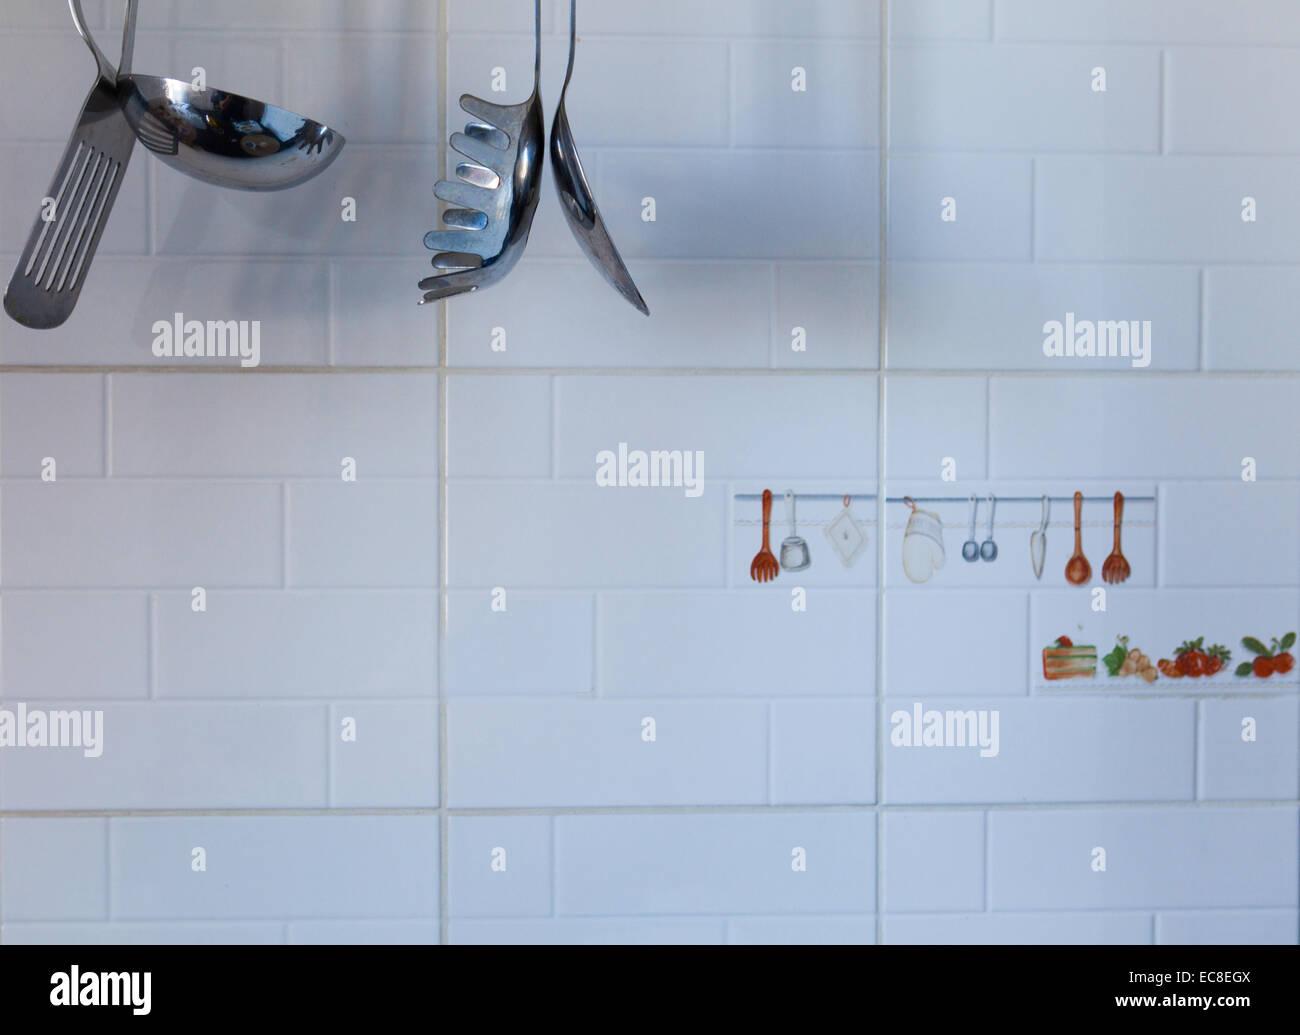 Cropped image of kitchen utensils hanging agains white metro tiles - Stock Image